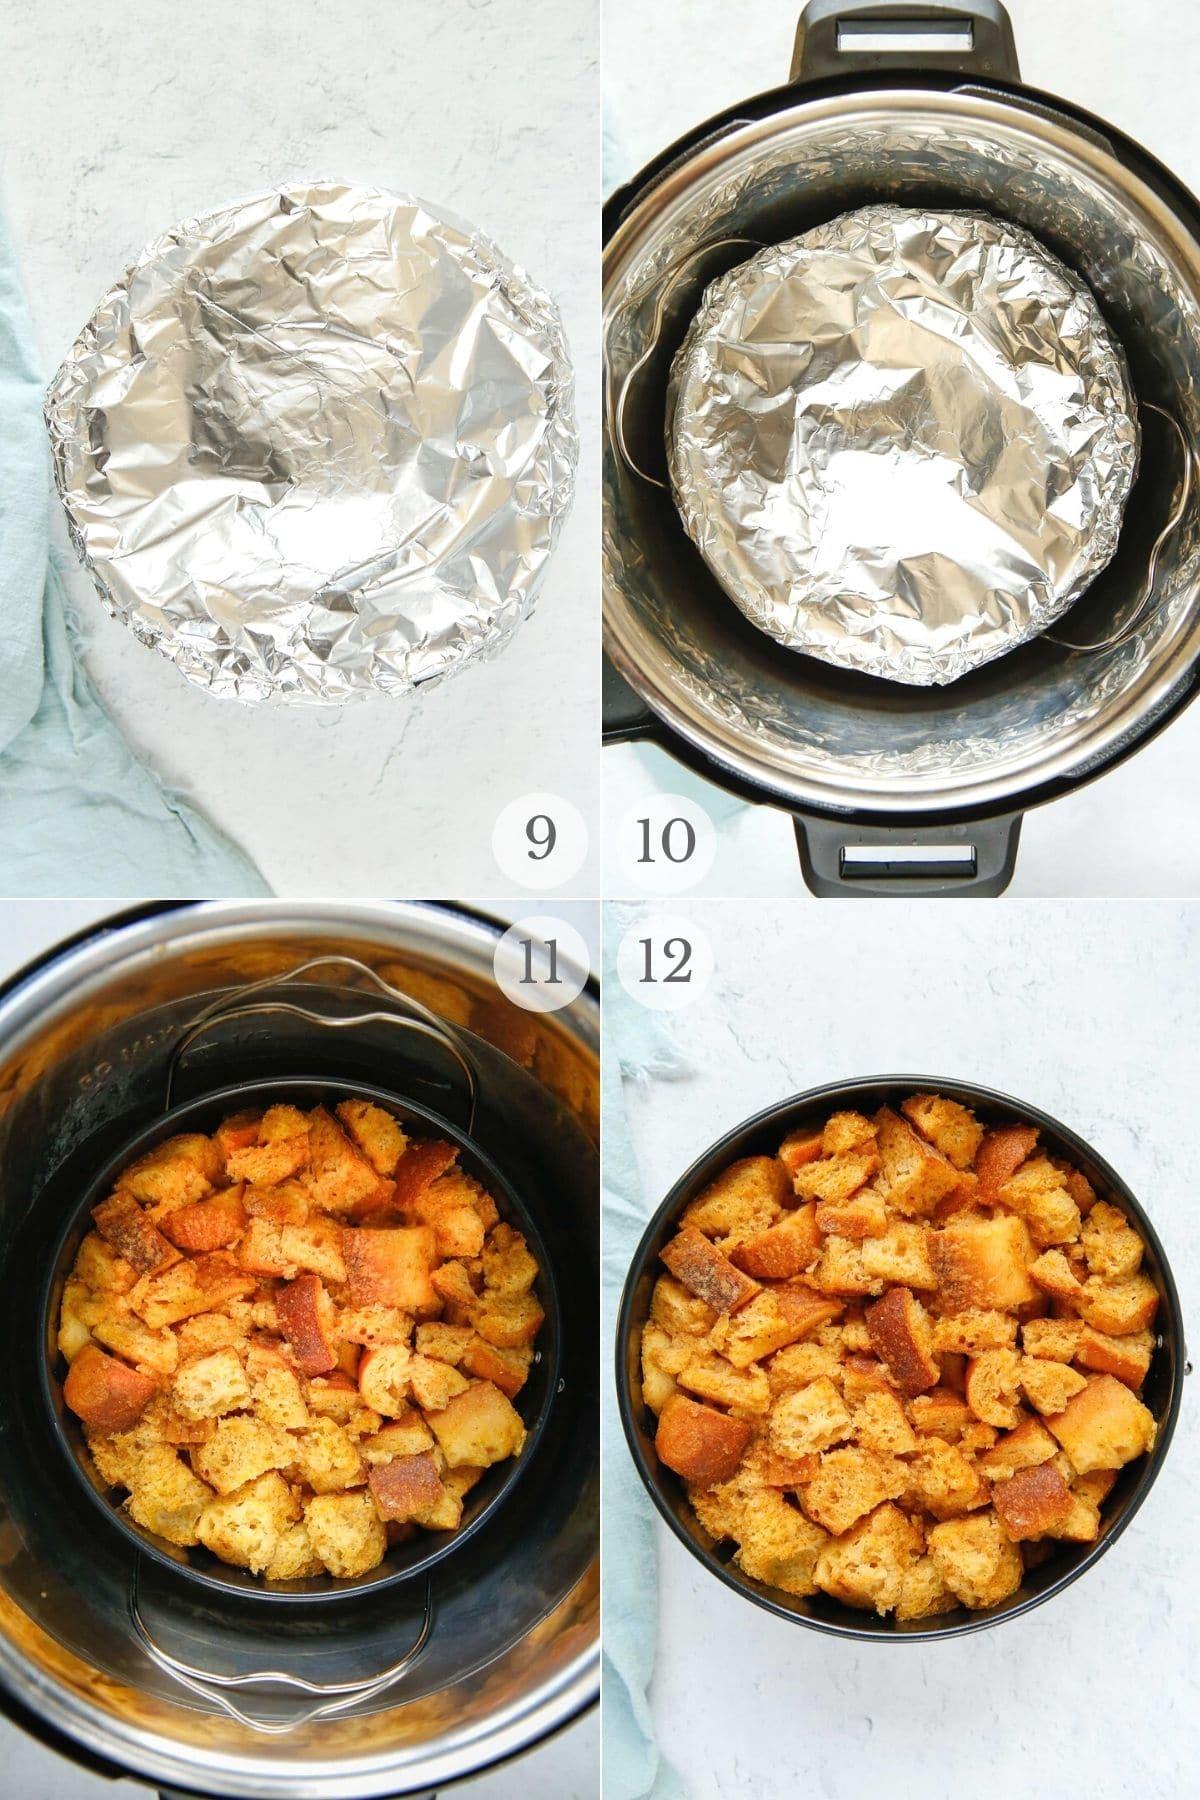 Pumpkin French Toast Casserole (Instant Pot) recipe steps 9-12a